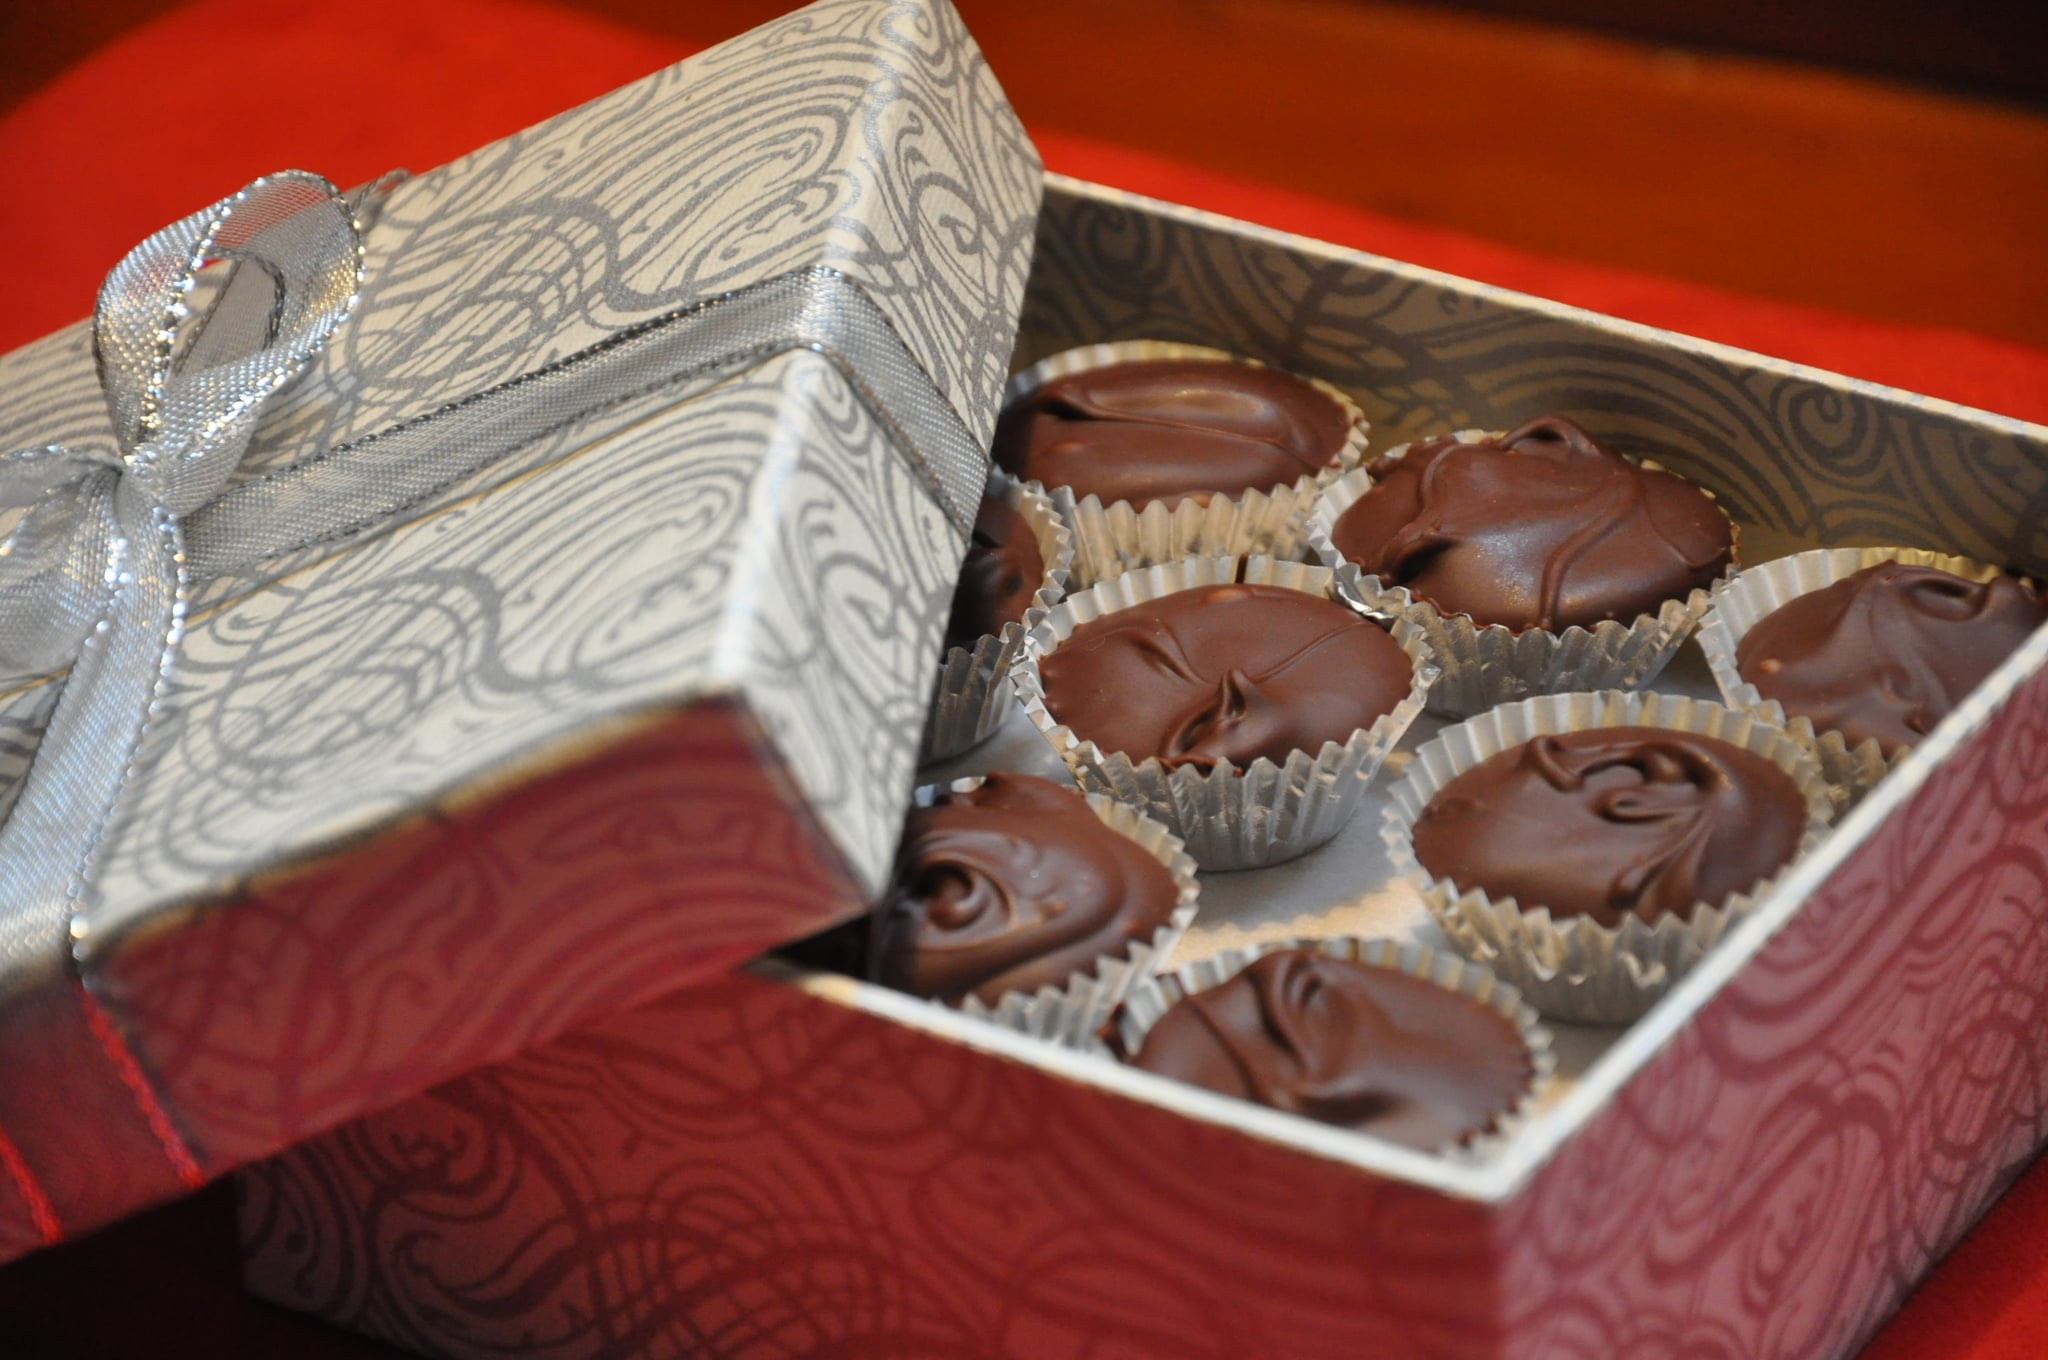 Homemade Chocolate Peanut Butter Cup Recipe | POPSUGAR Food